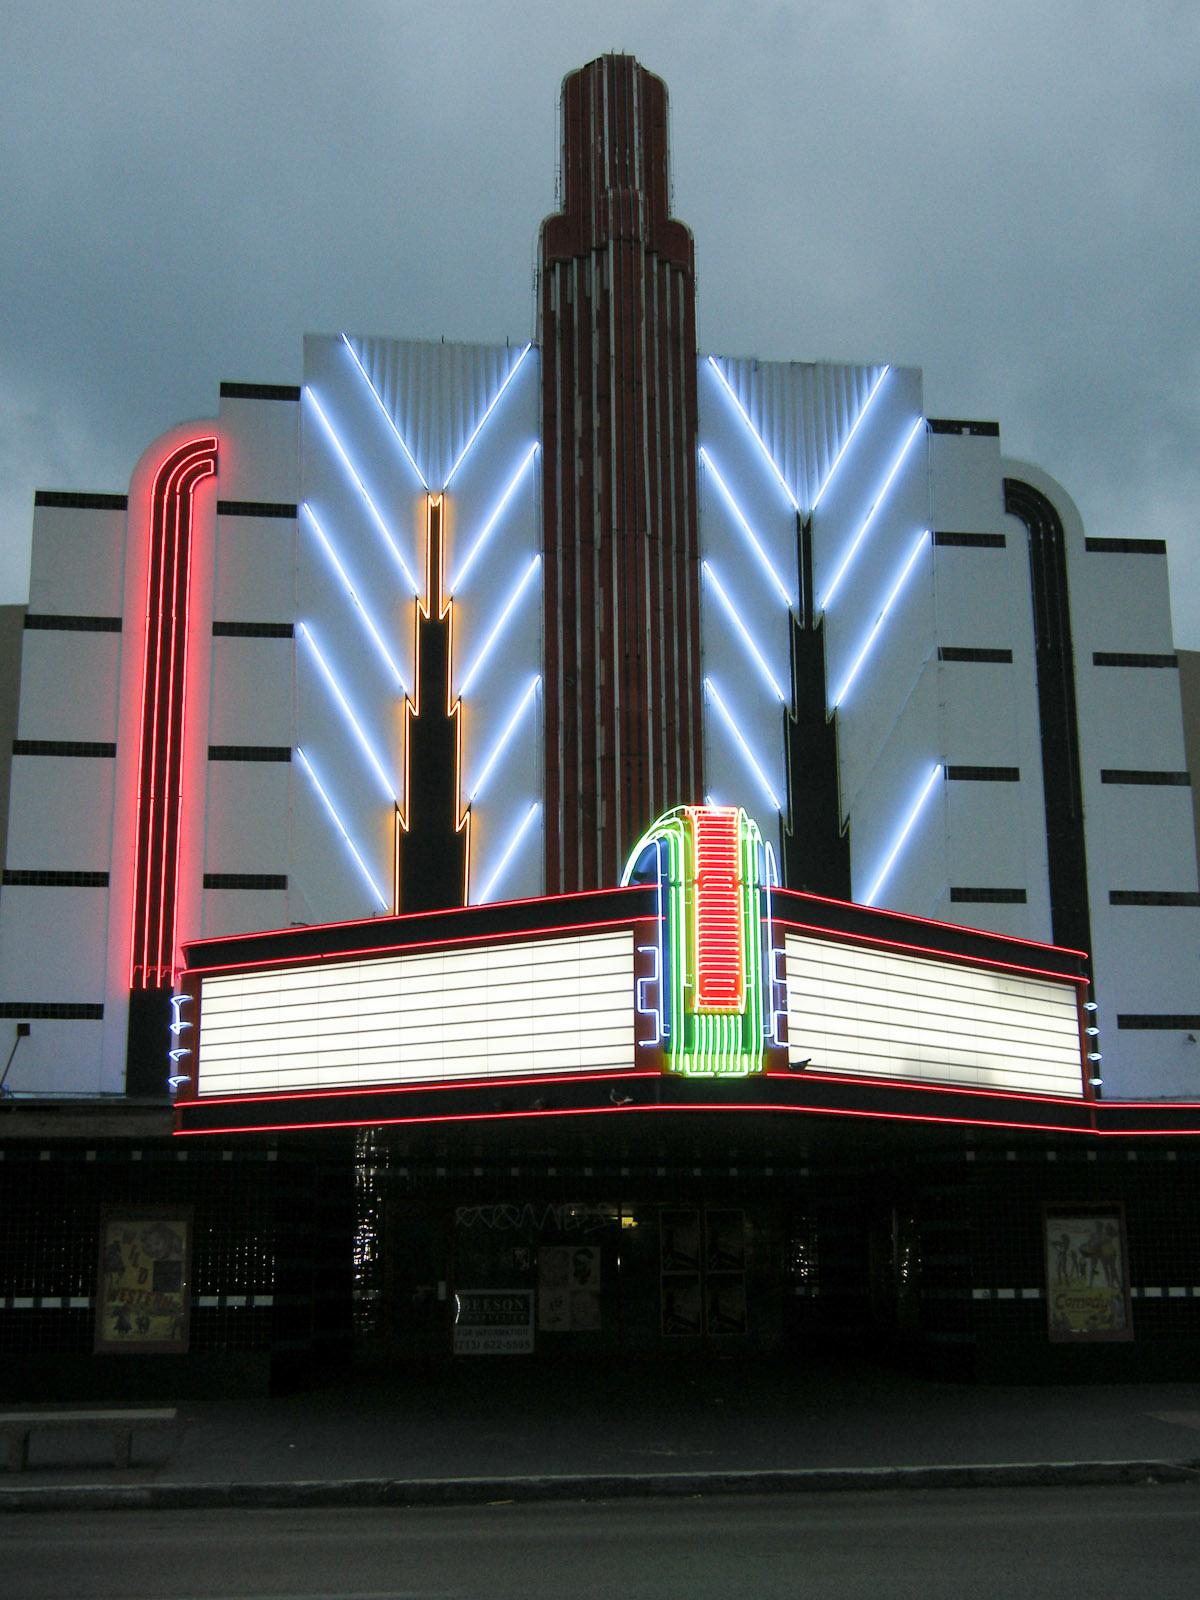 News_Tower Theater_neon_night_straight